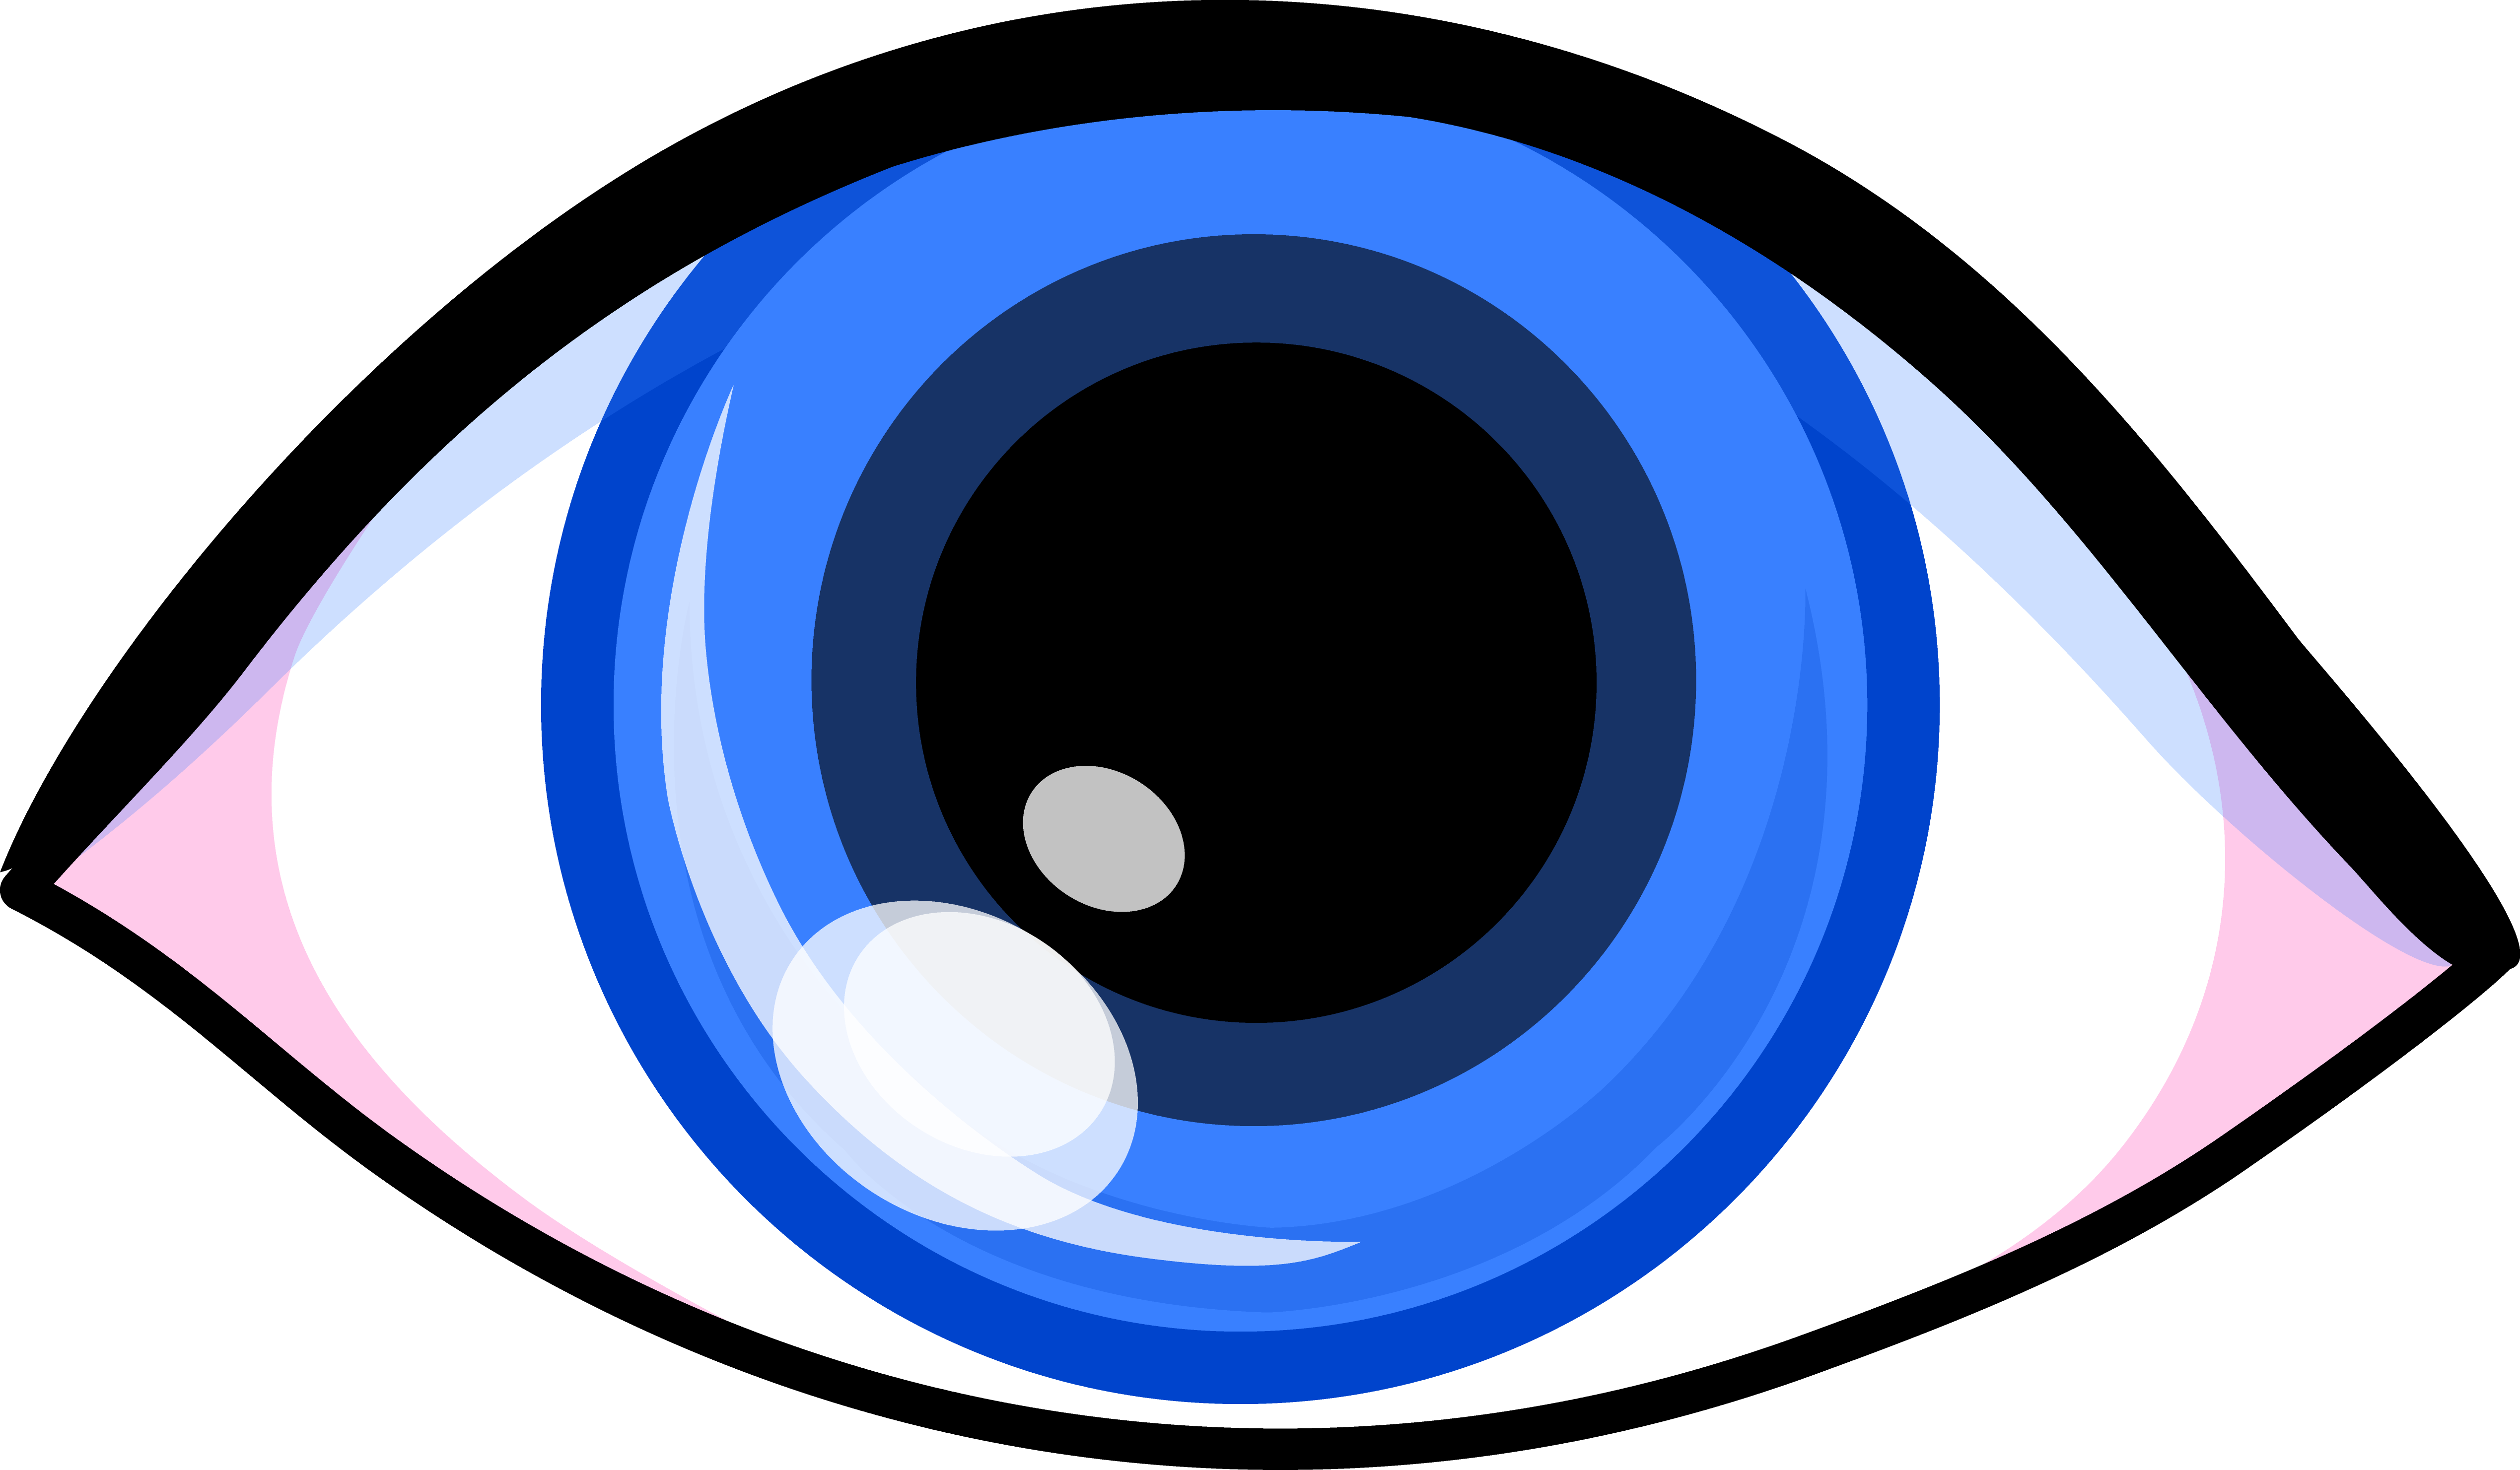 5076x2962 Eyeball Clipart Simple Eye